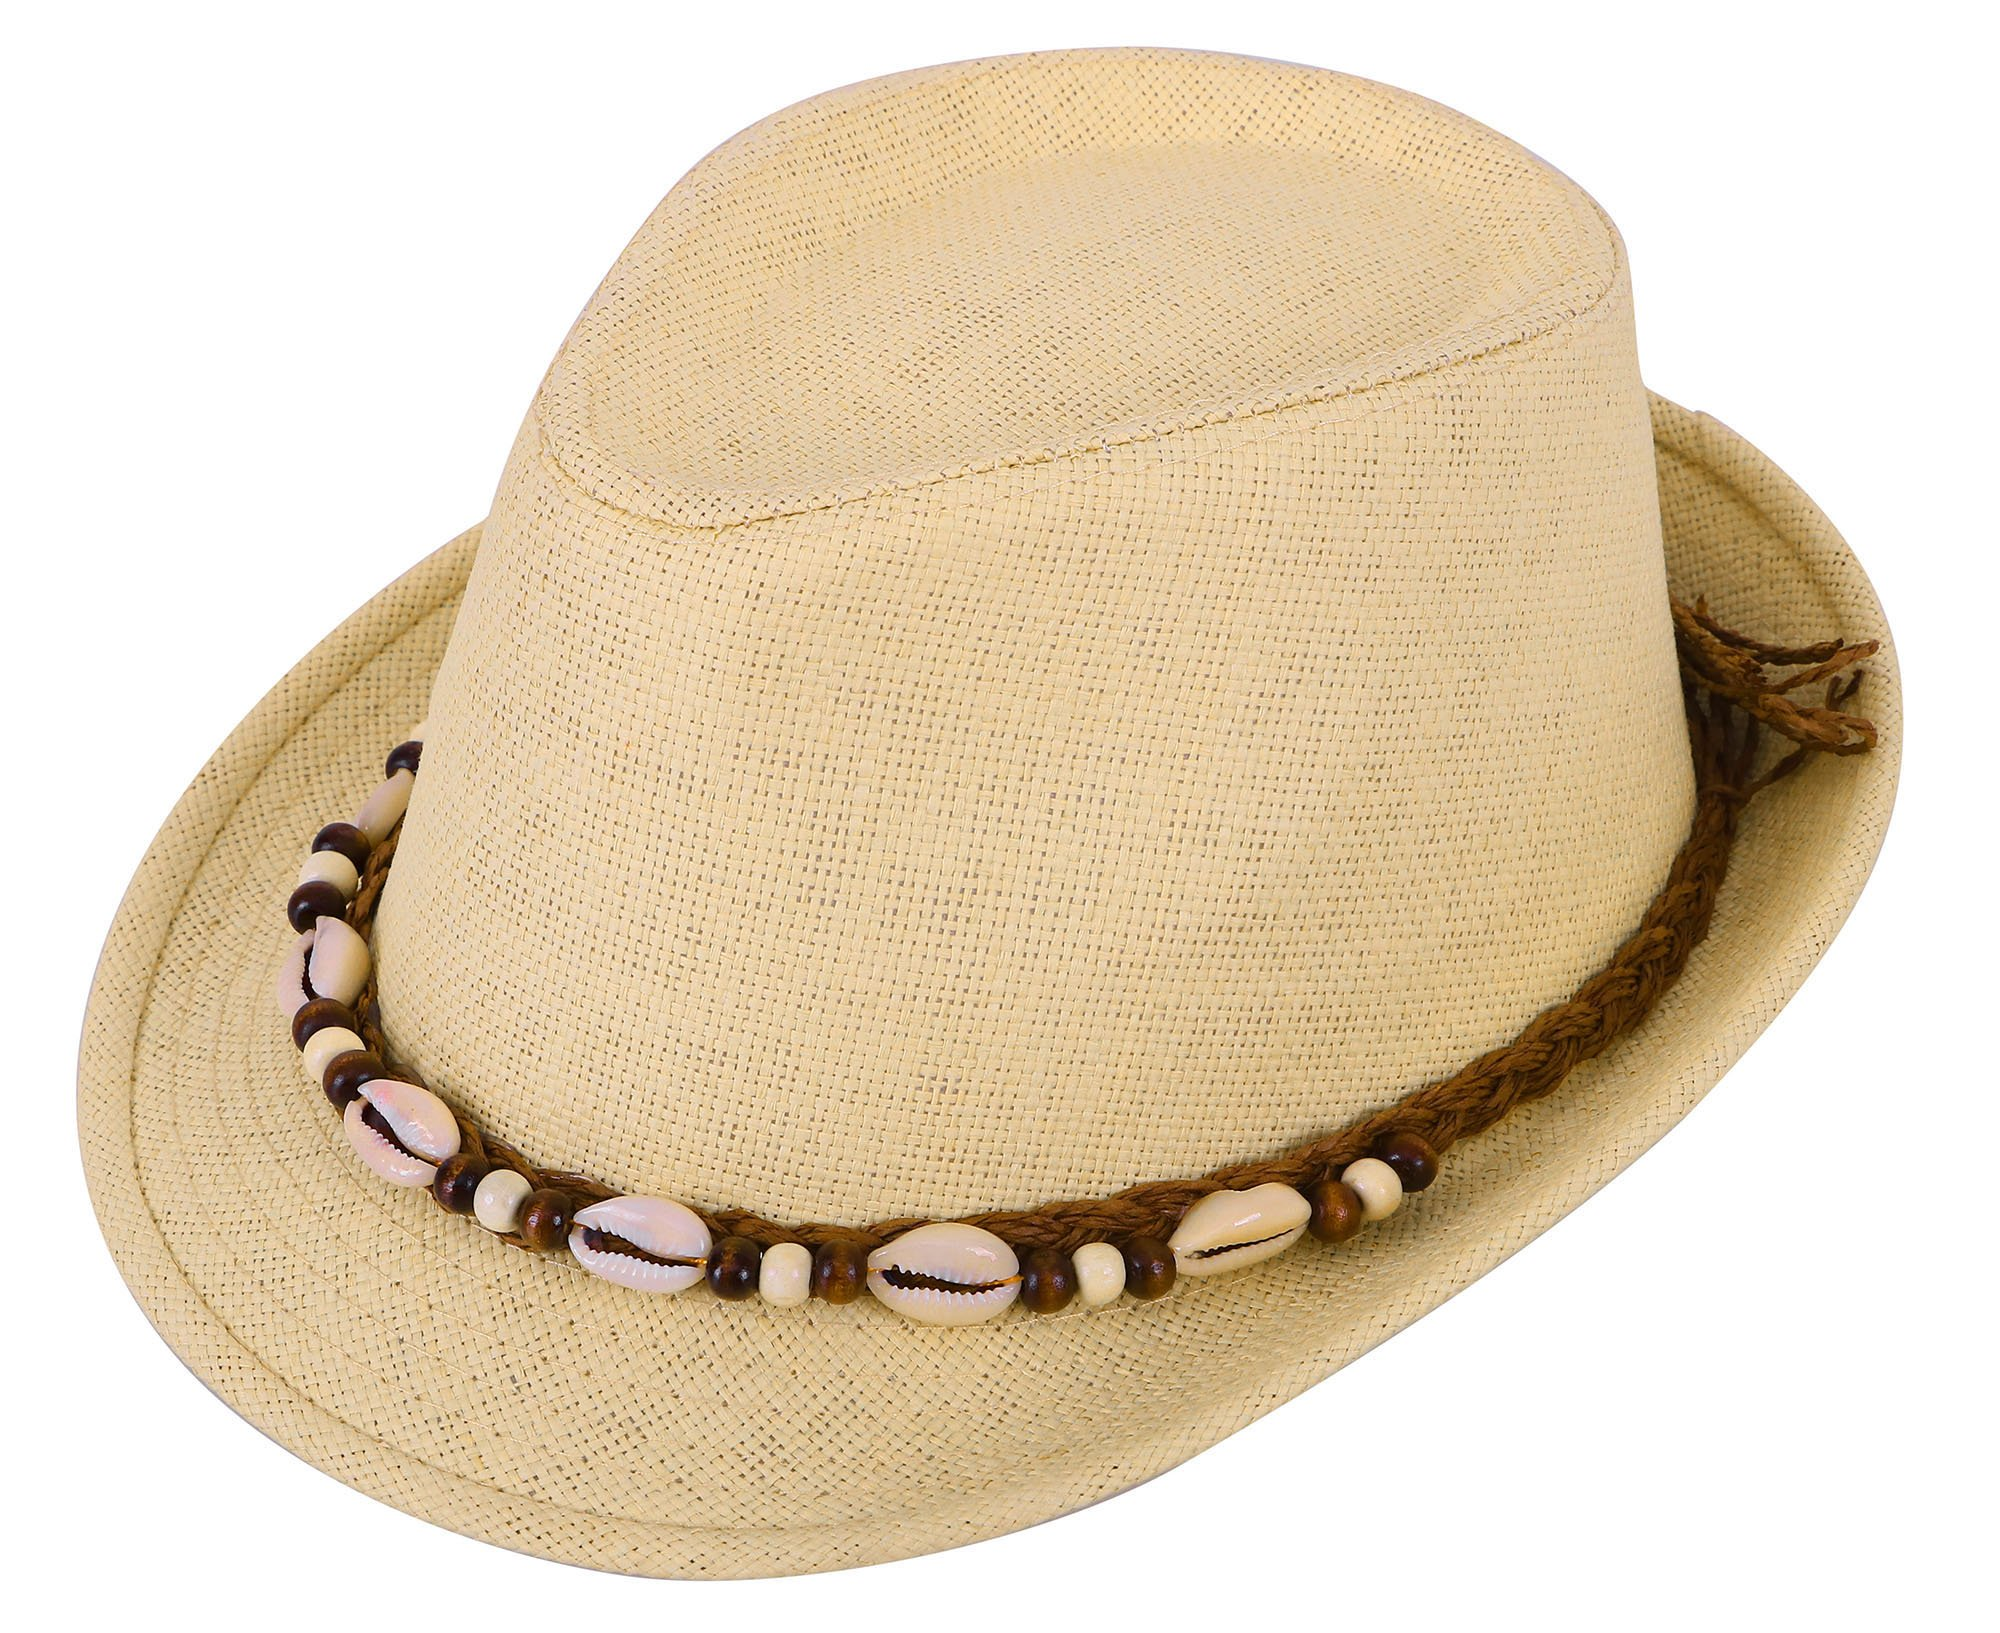 Jasmine Trilby Hat Men/Women's Panama Fedora Straw Hat Beach Cap,Beige,L/XL